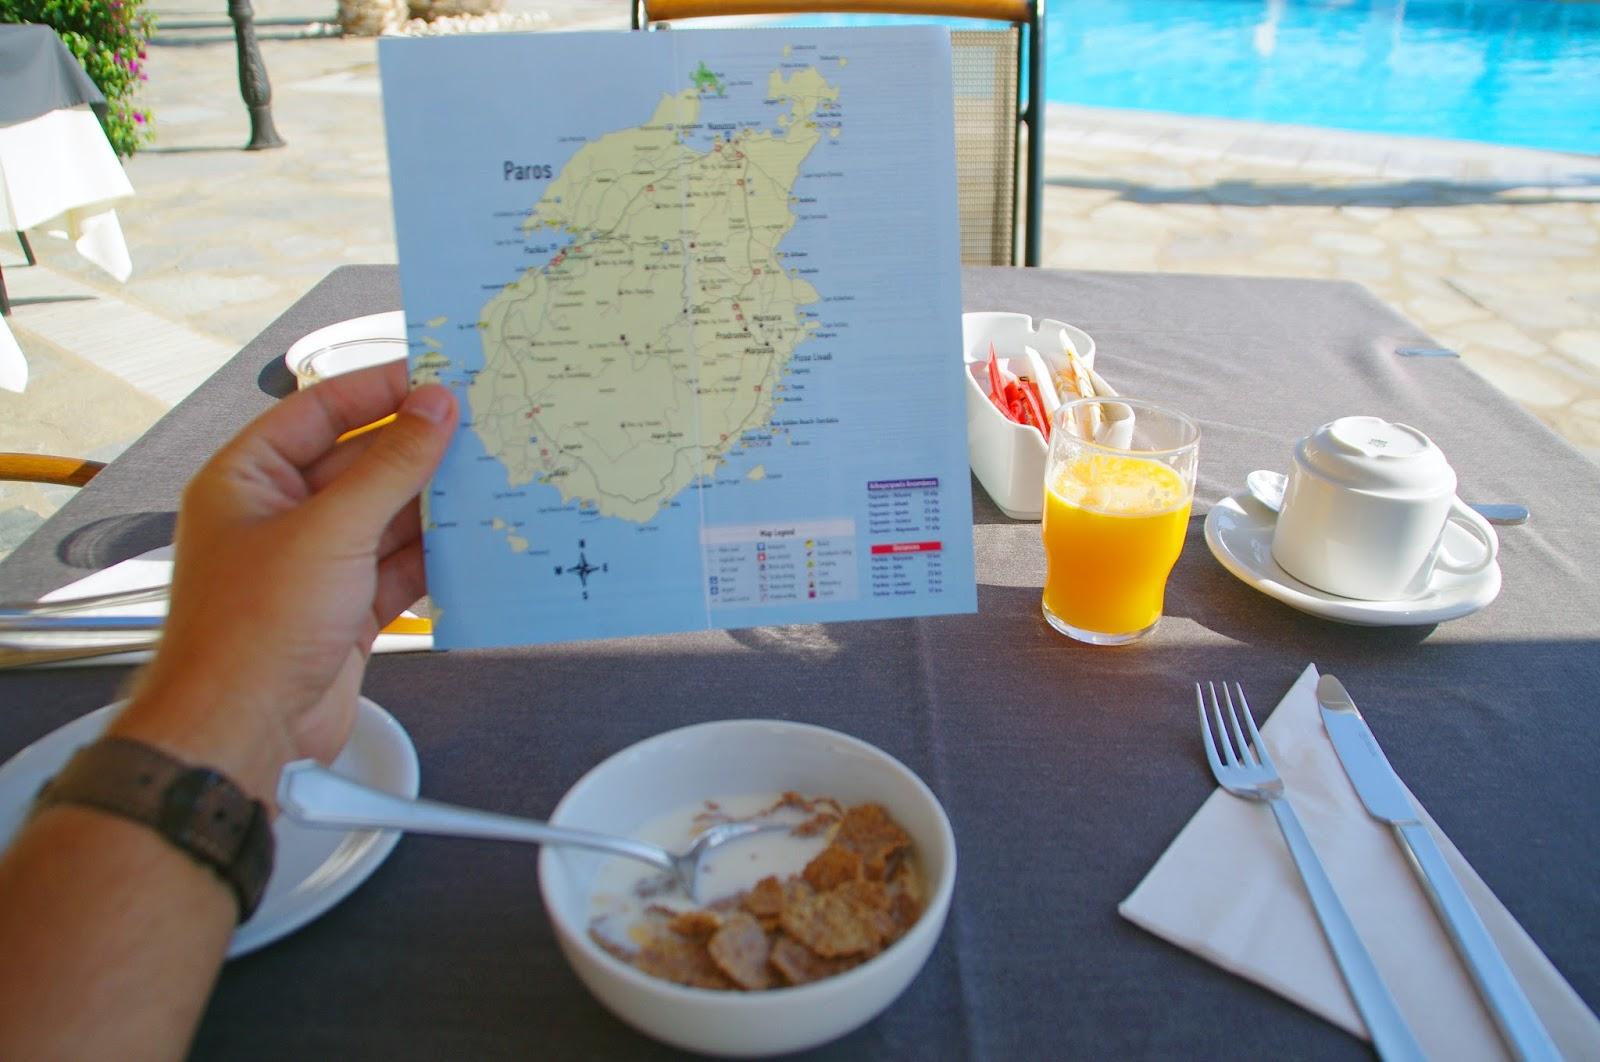 Astir of Paros Breakfast and planning adventures